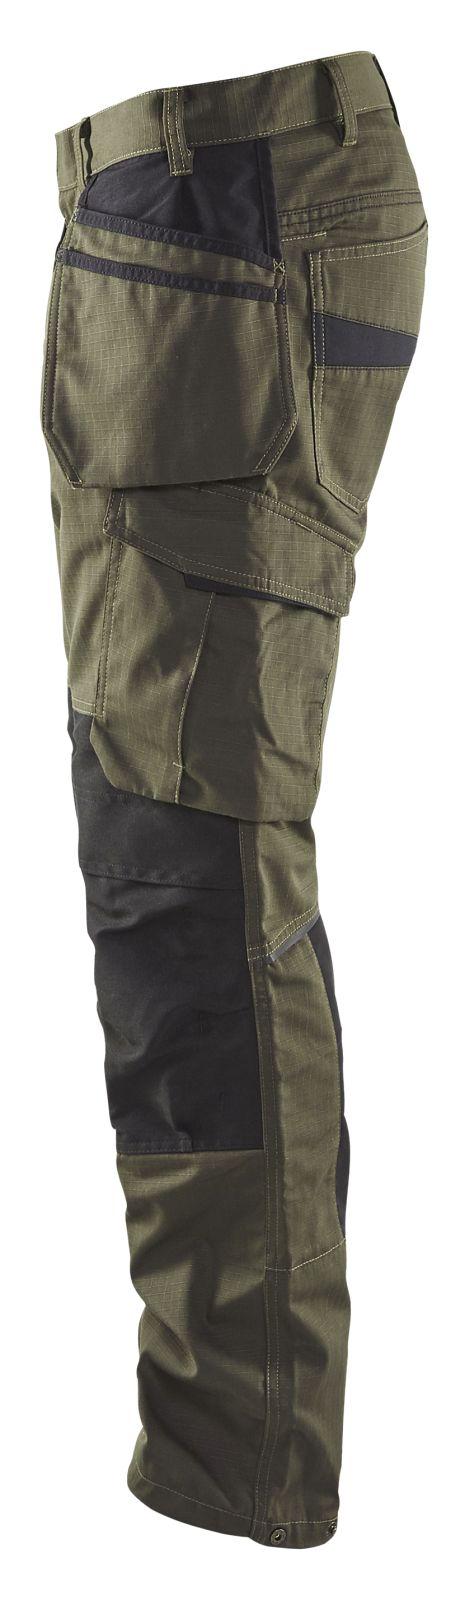 Blaklader Werkbroeken 14961330 met Stretch groen-zwart(4599)